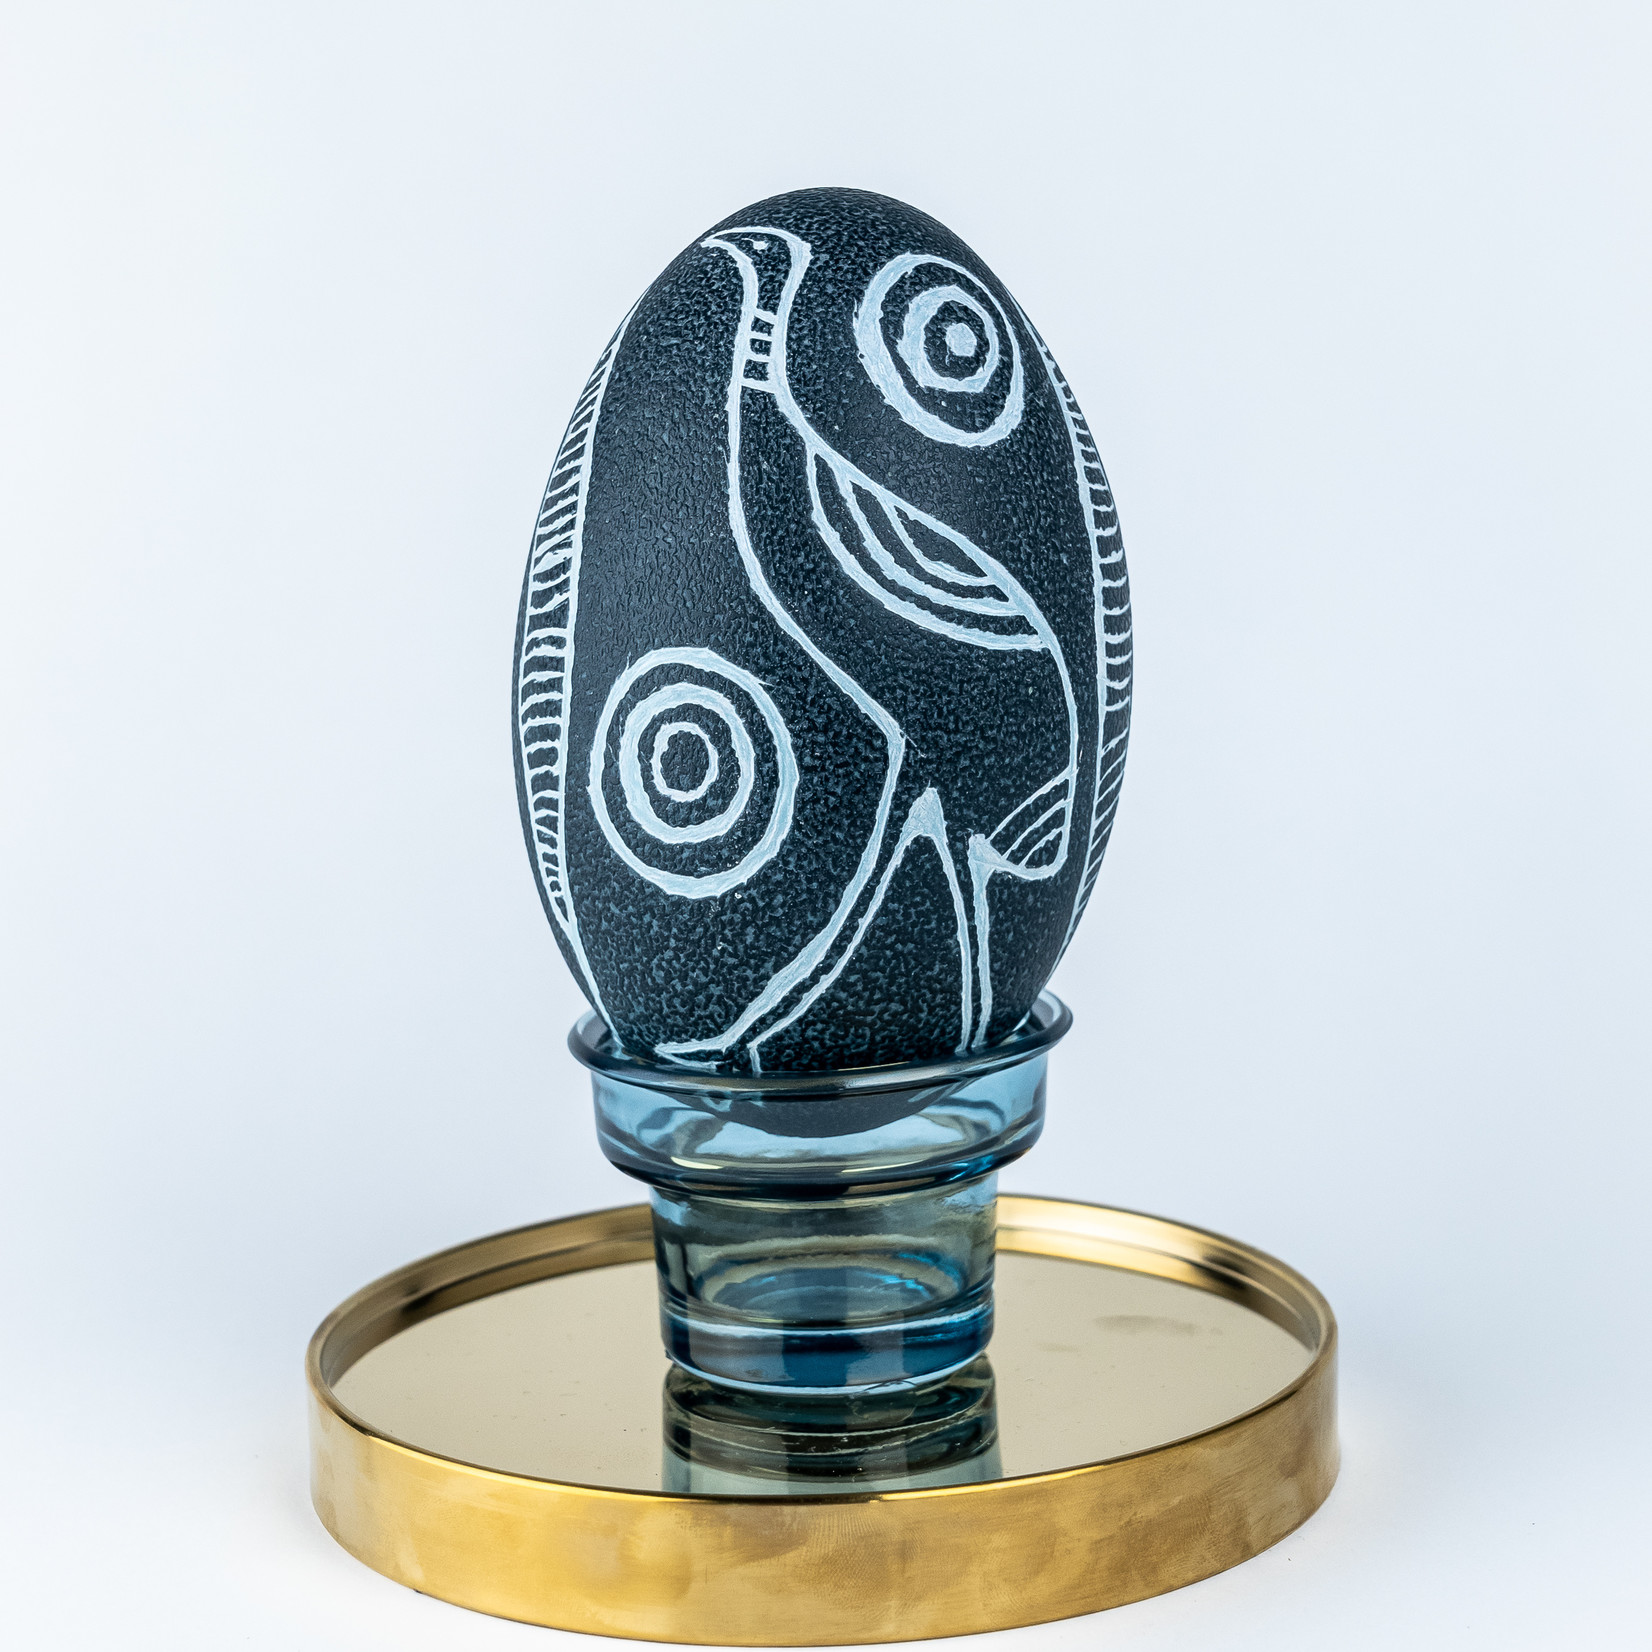 Brendan Kennedy Carved Emu Egg - Brendan Kennedy